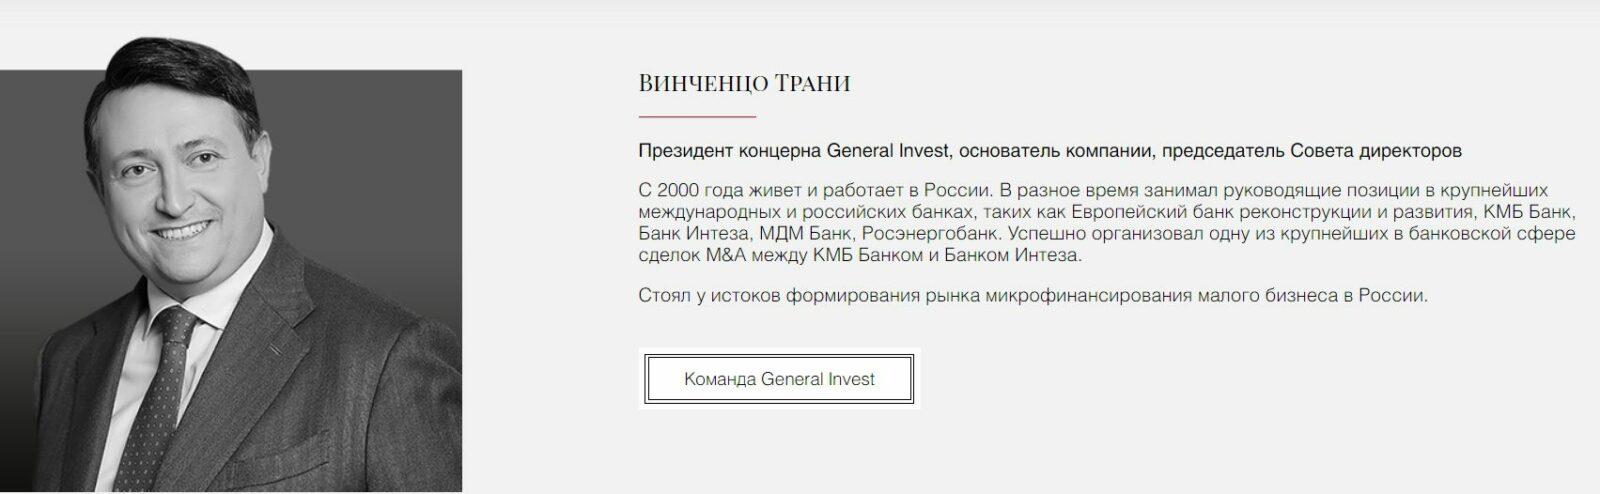 Президент компании Дженерал Инвест